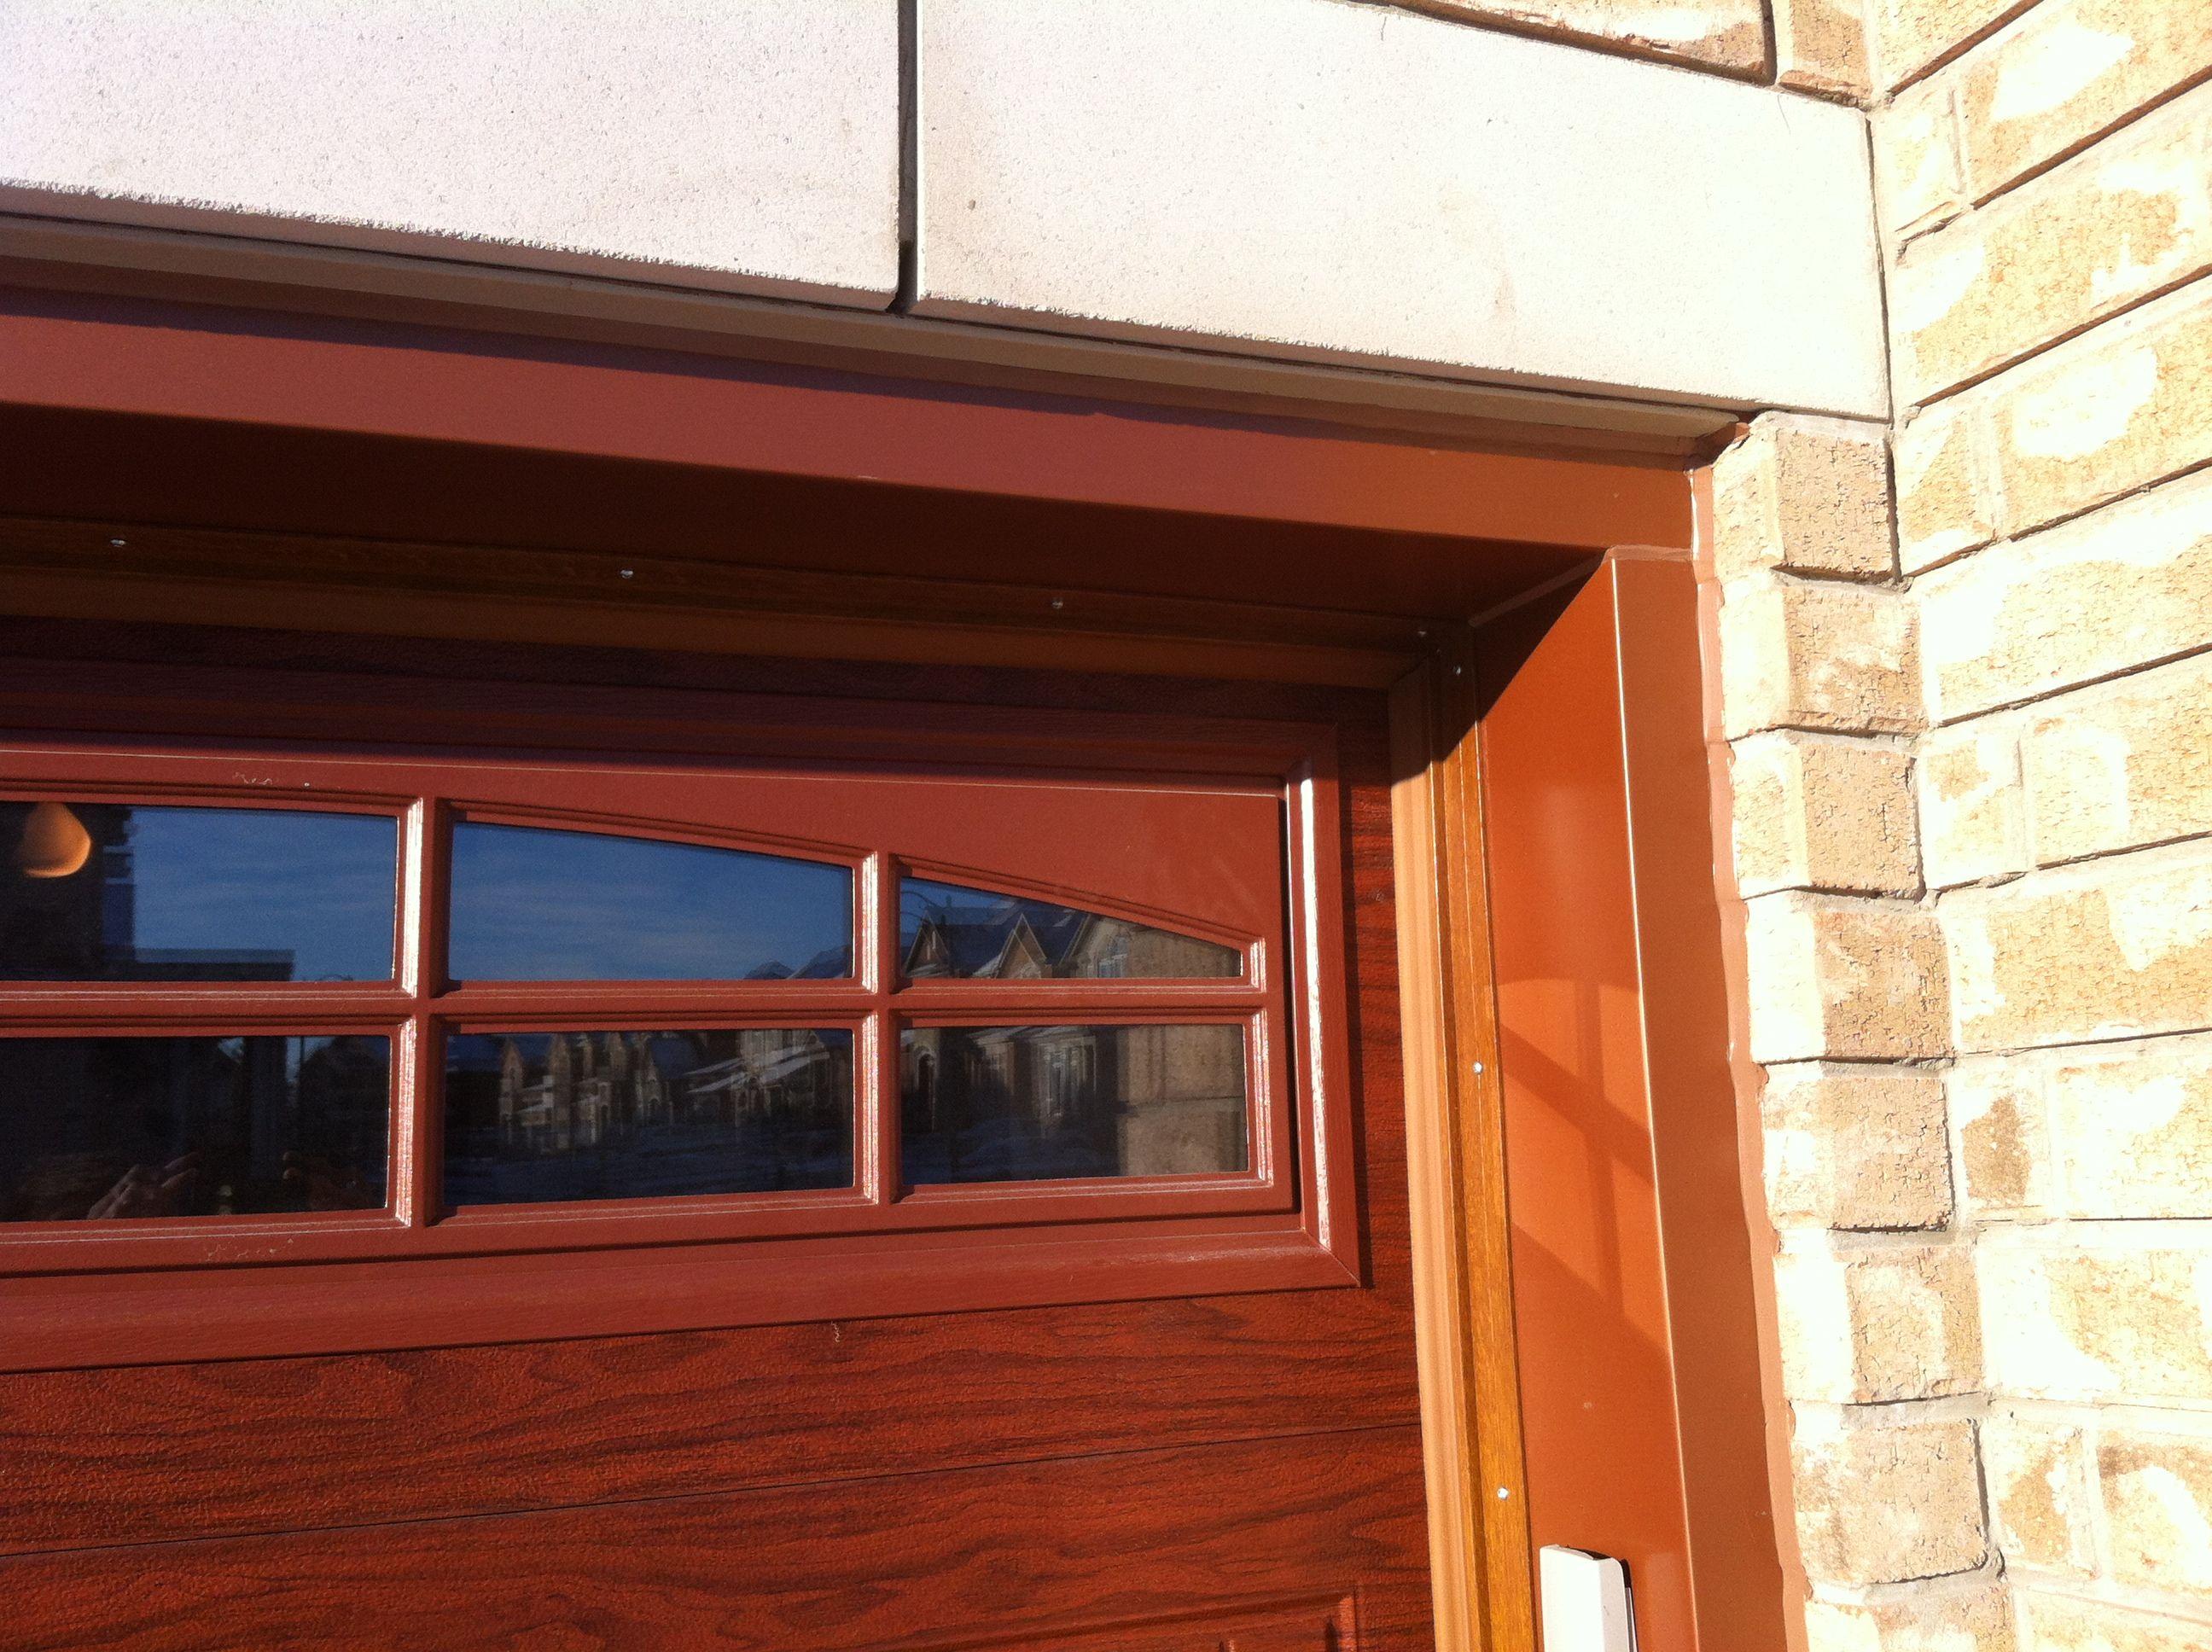 Garage door capping caulking custom color to match garage door & Garage door capping caulking custom color to match garage door ...